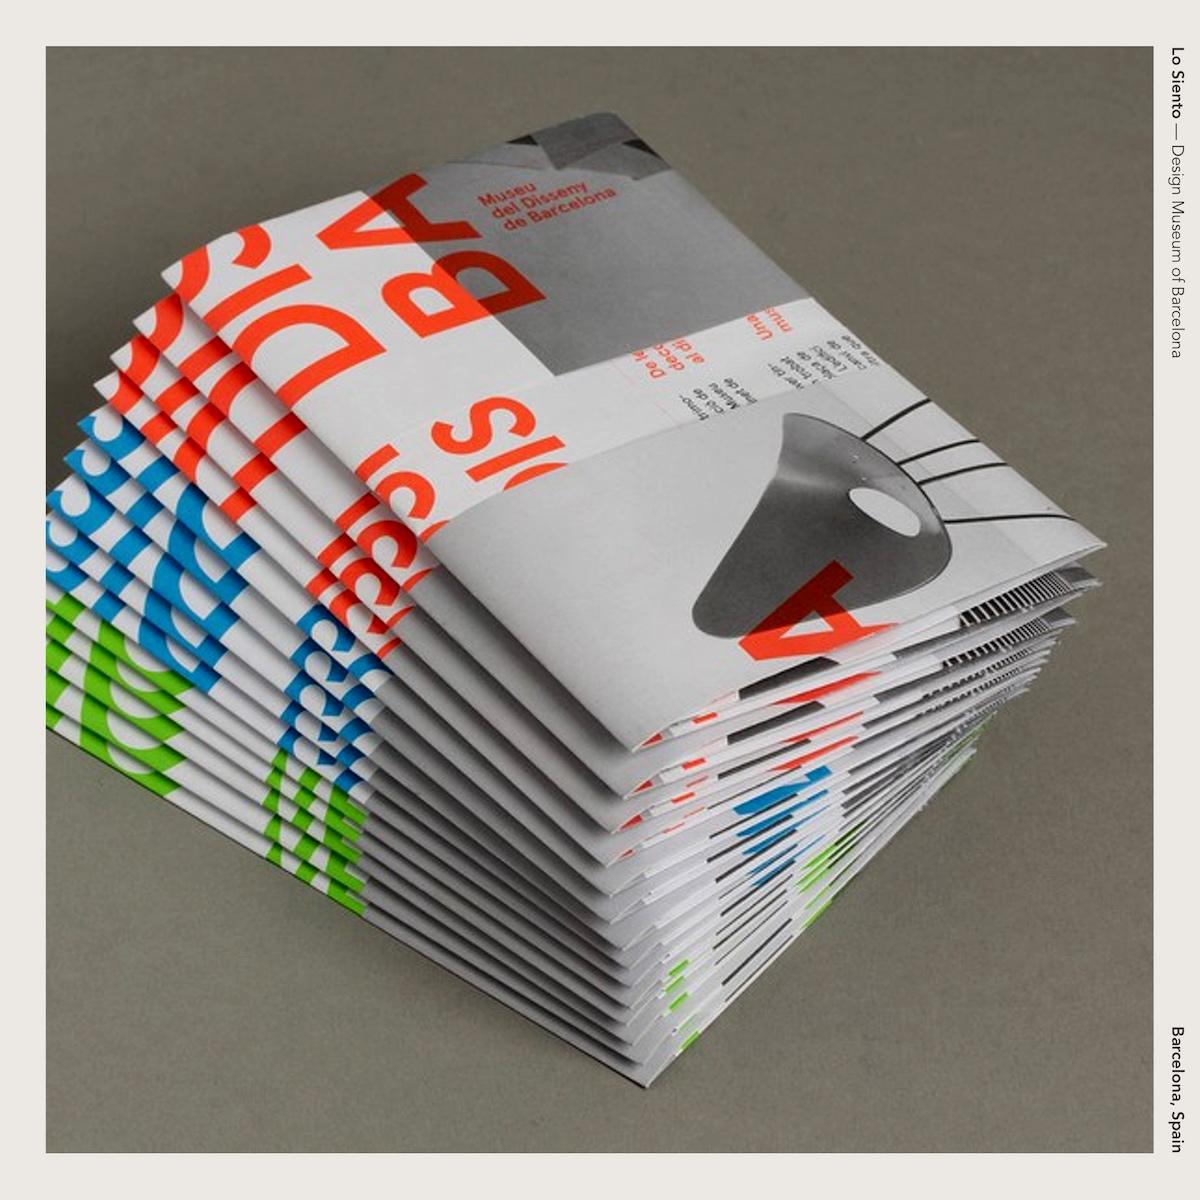 Lo Siento —Design Museum of Barcelona